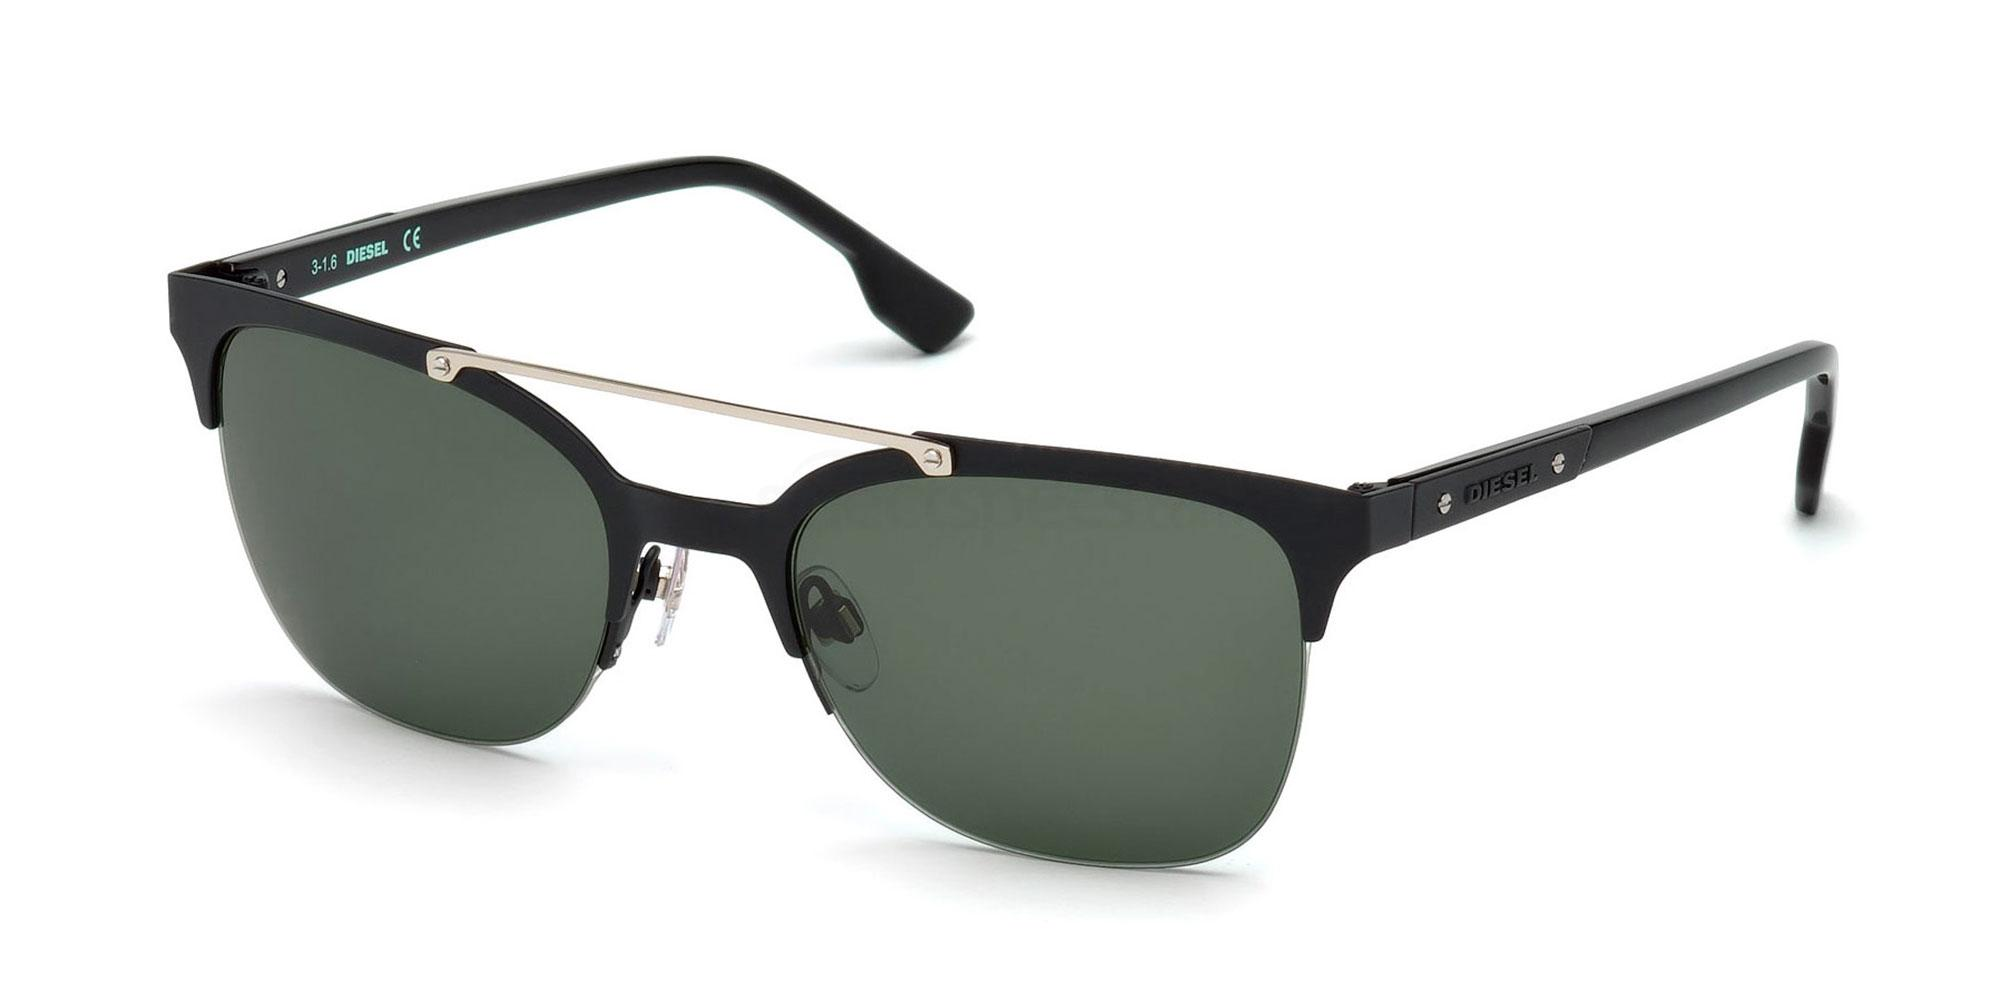 02A DL0215 Sunglasses, Diesel